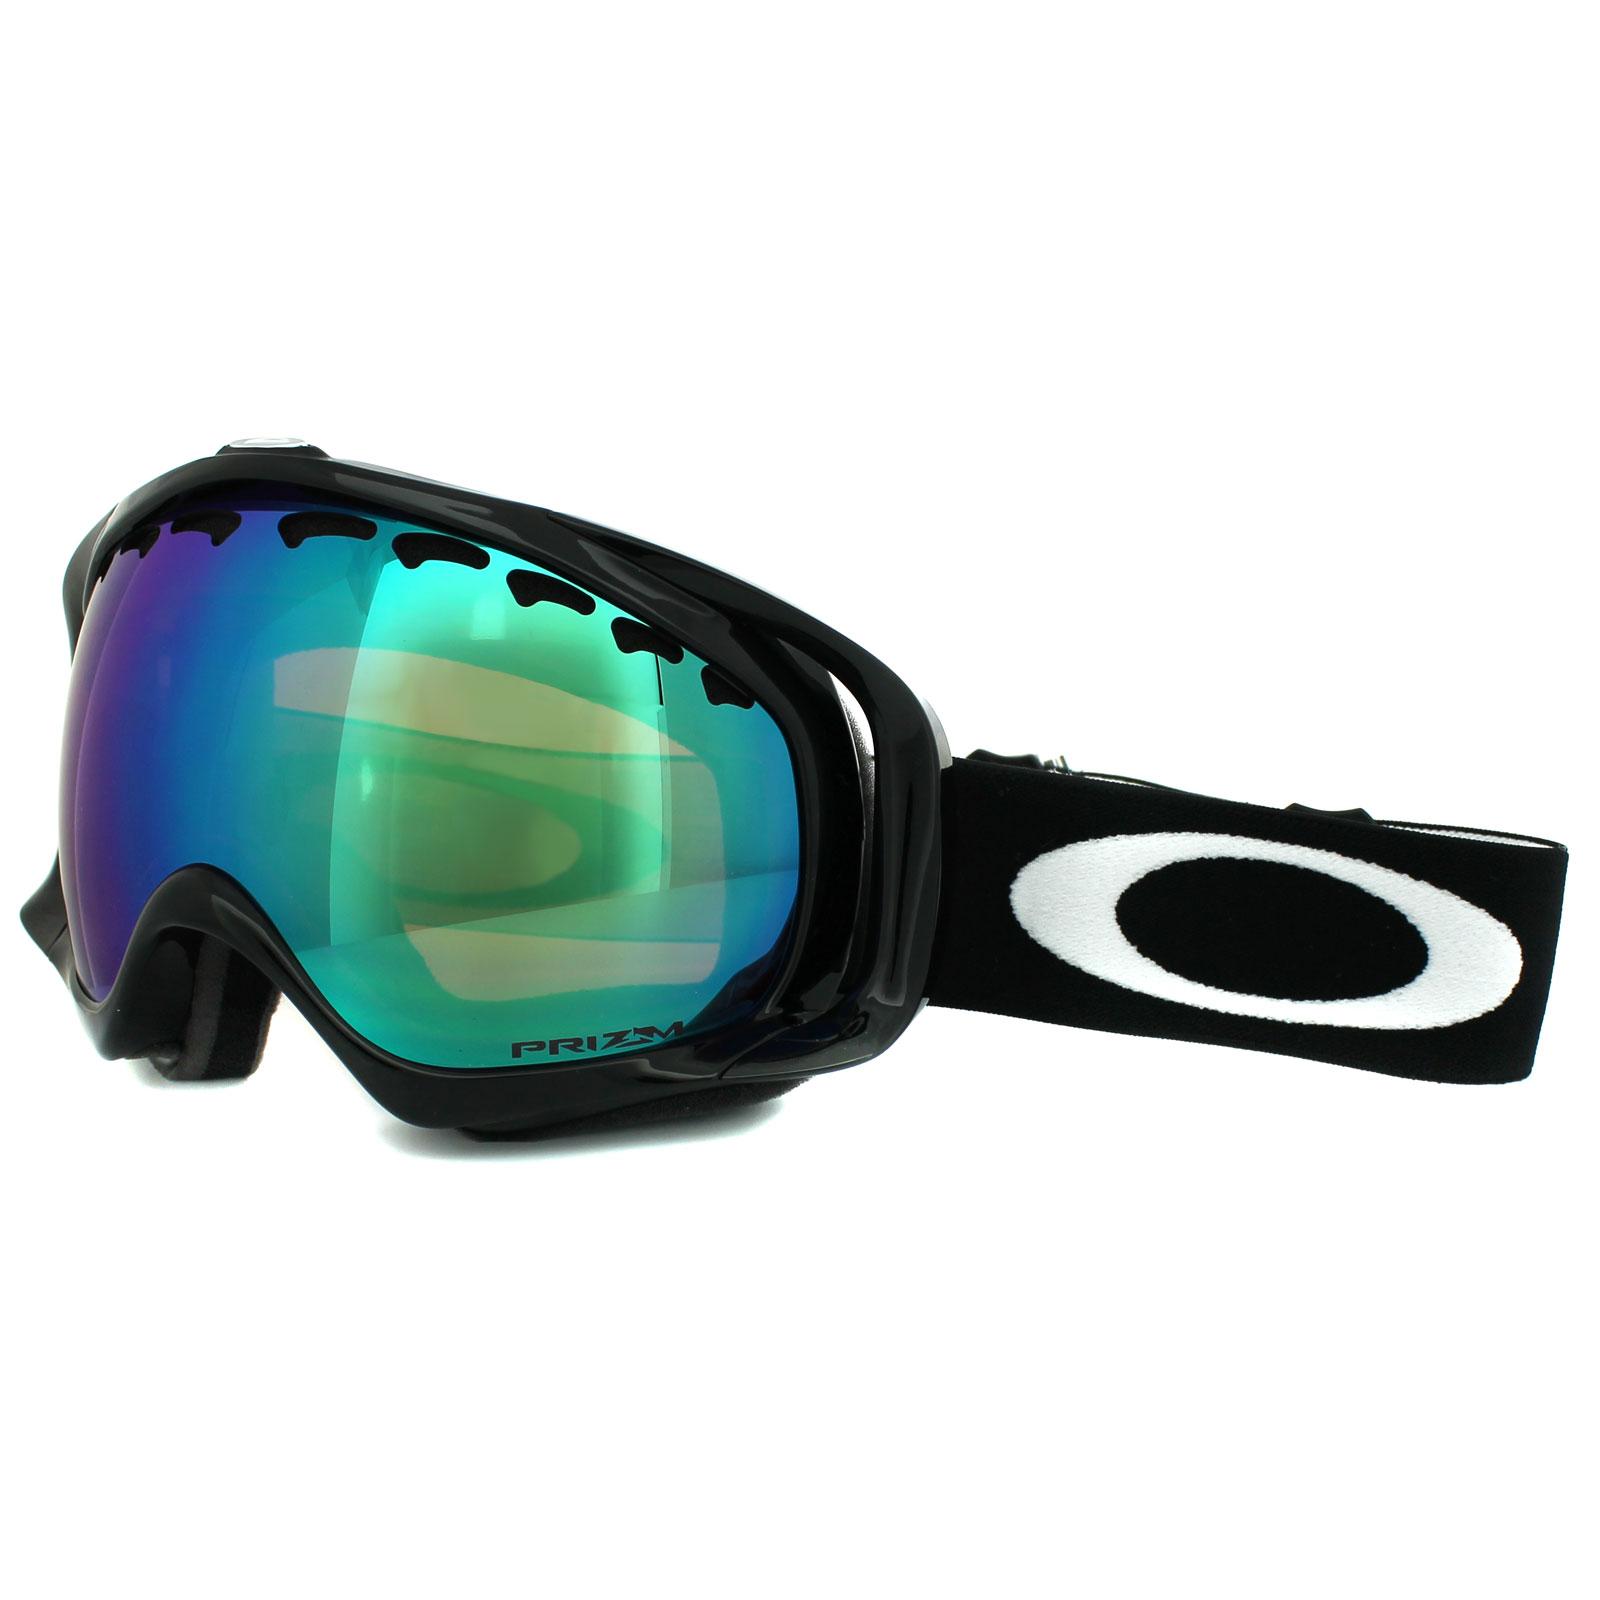 oakley elevate goggles hc4j  Oakley Crowbar Goggles